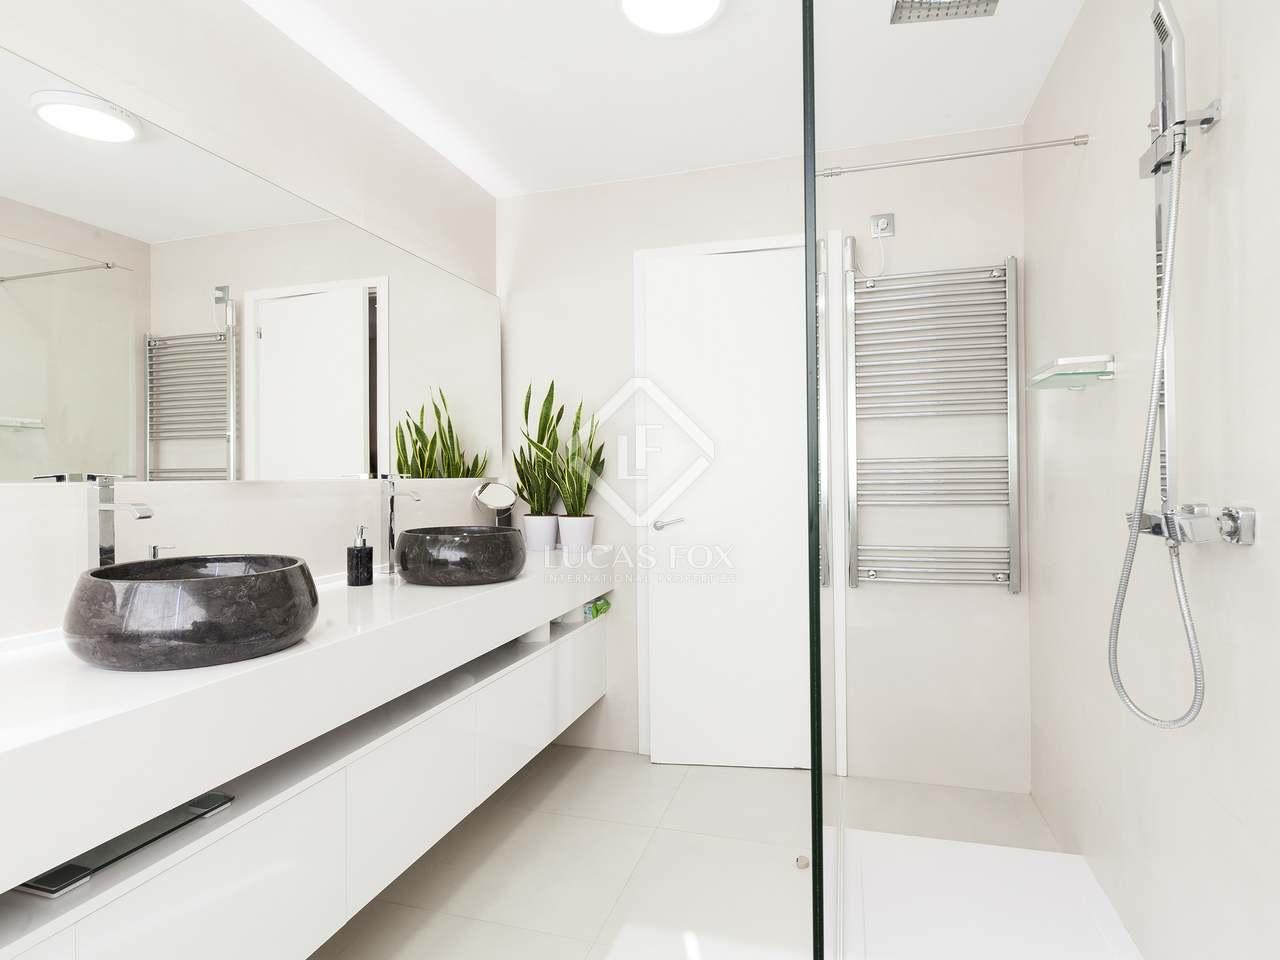 Casa moderna en venta en castelldefels barcelona for Compartir piso castelldefels